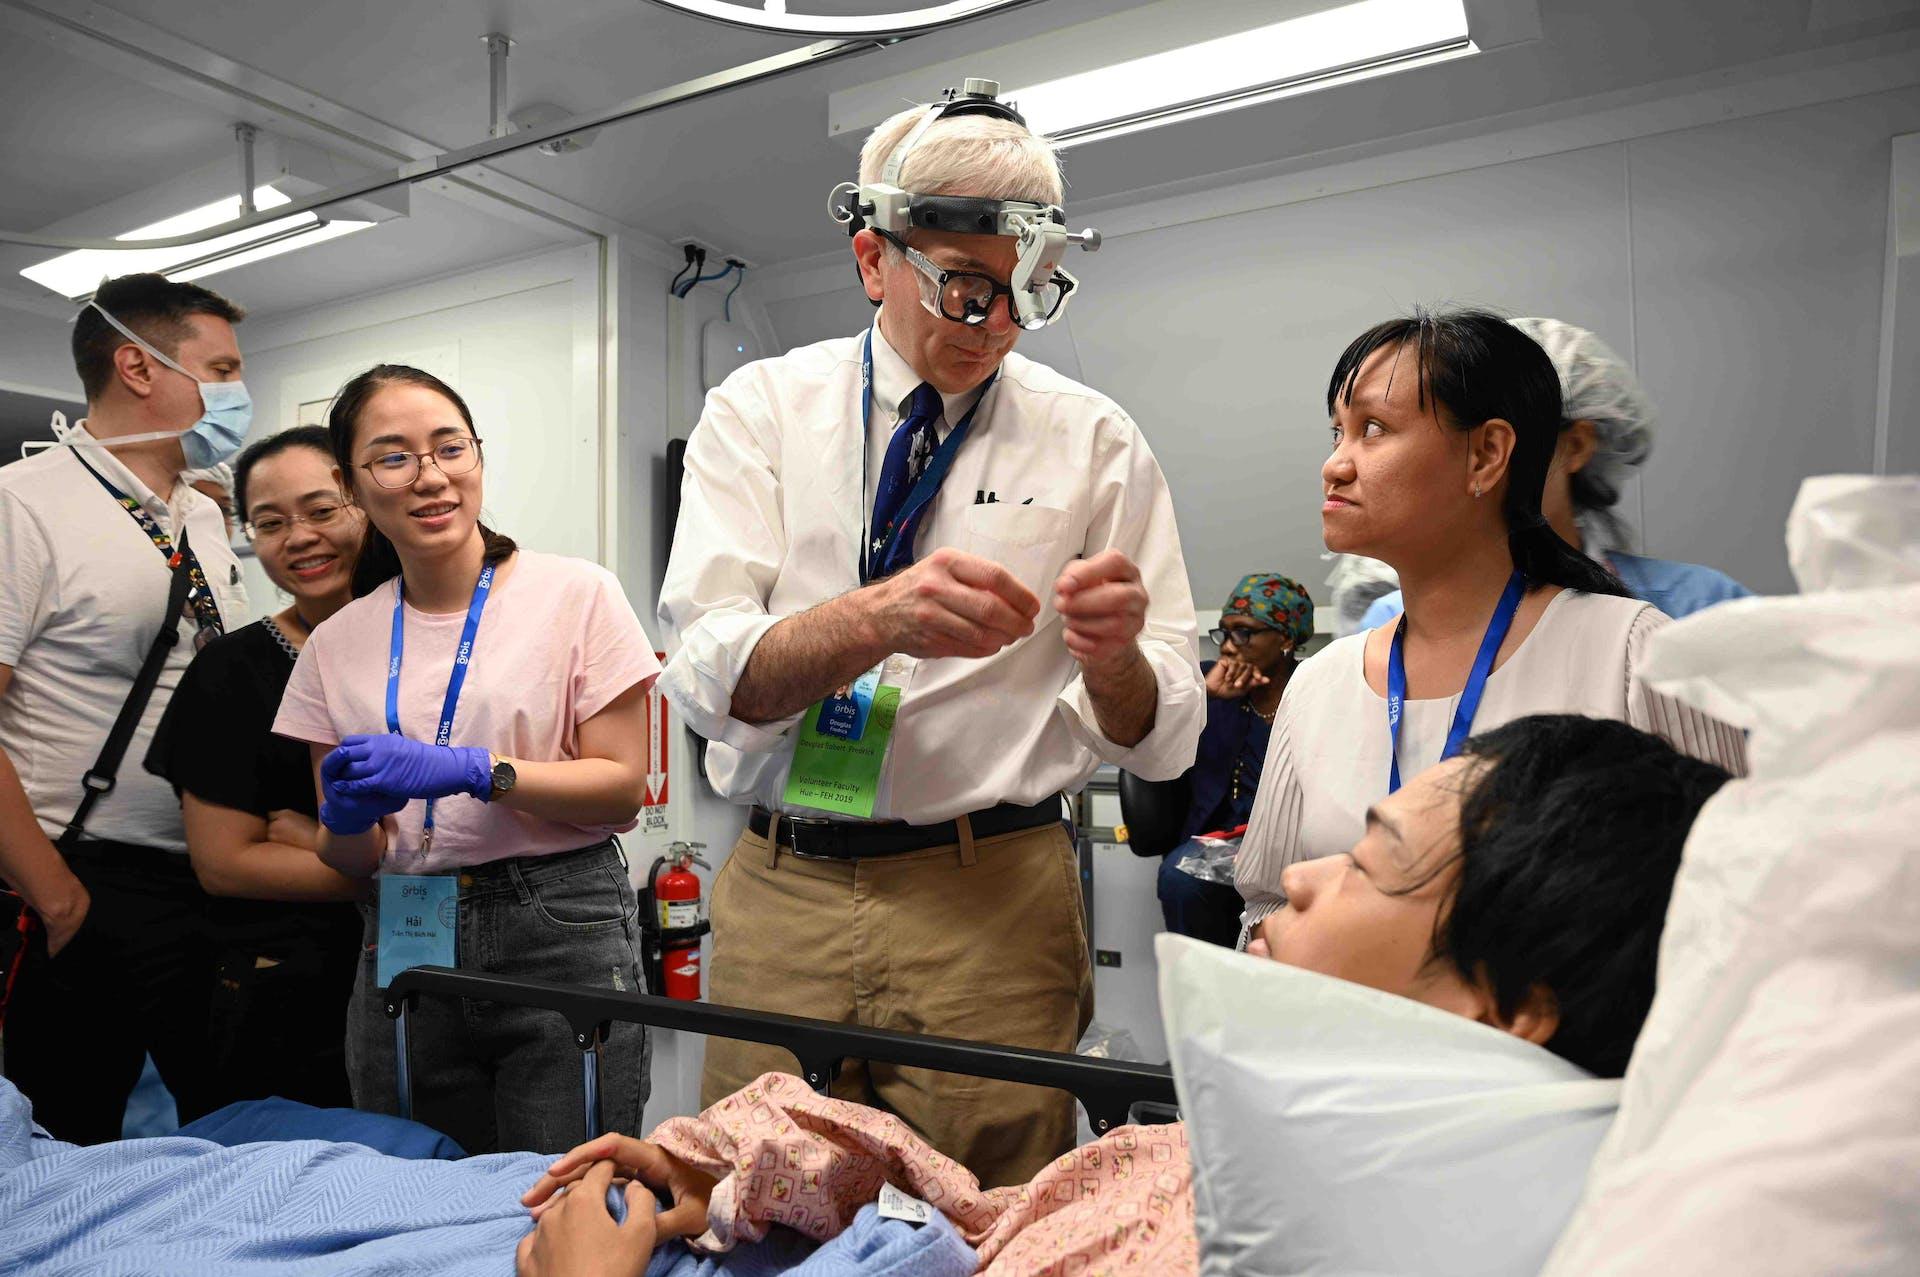 Dr. Douglas Fredrick training local eye doctors in Hue, Vietnam